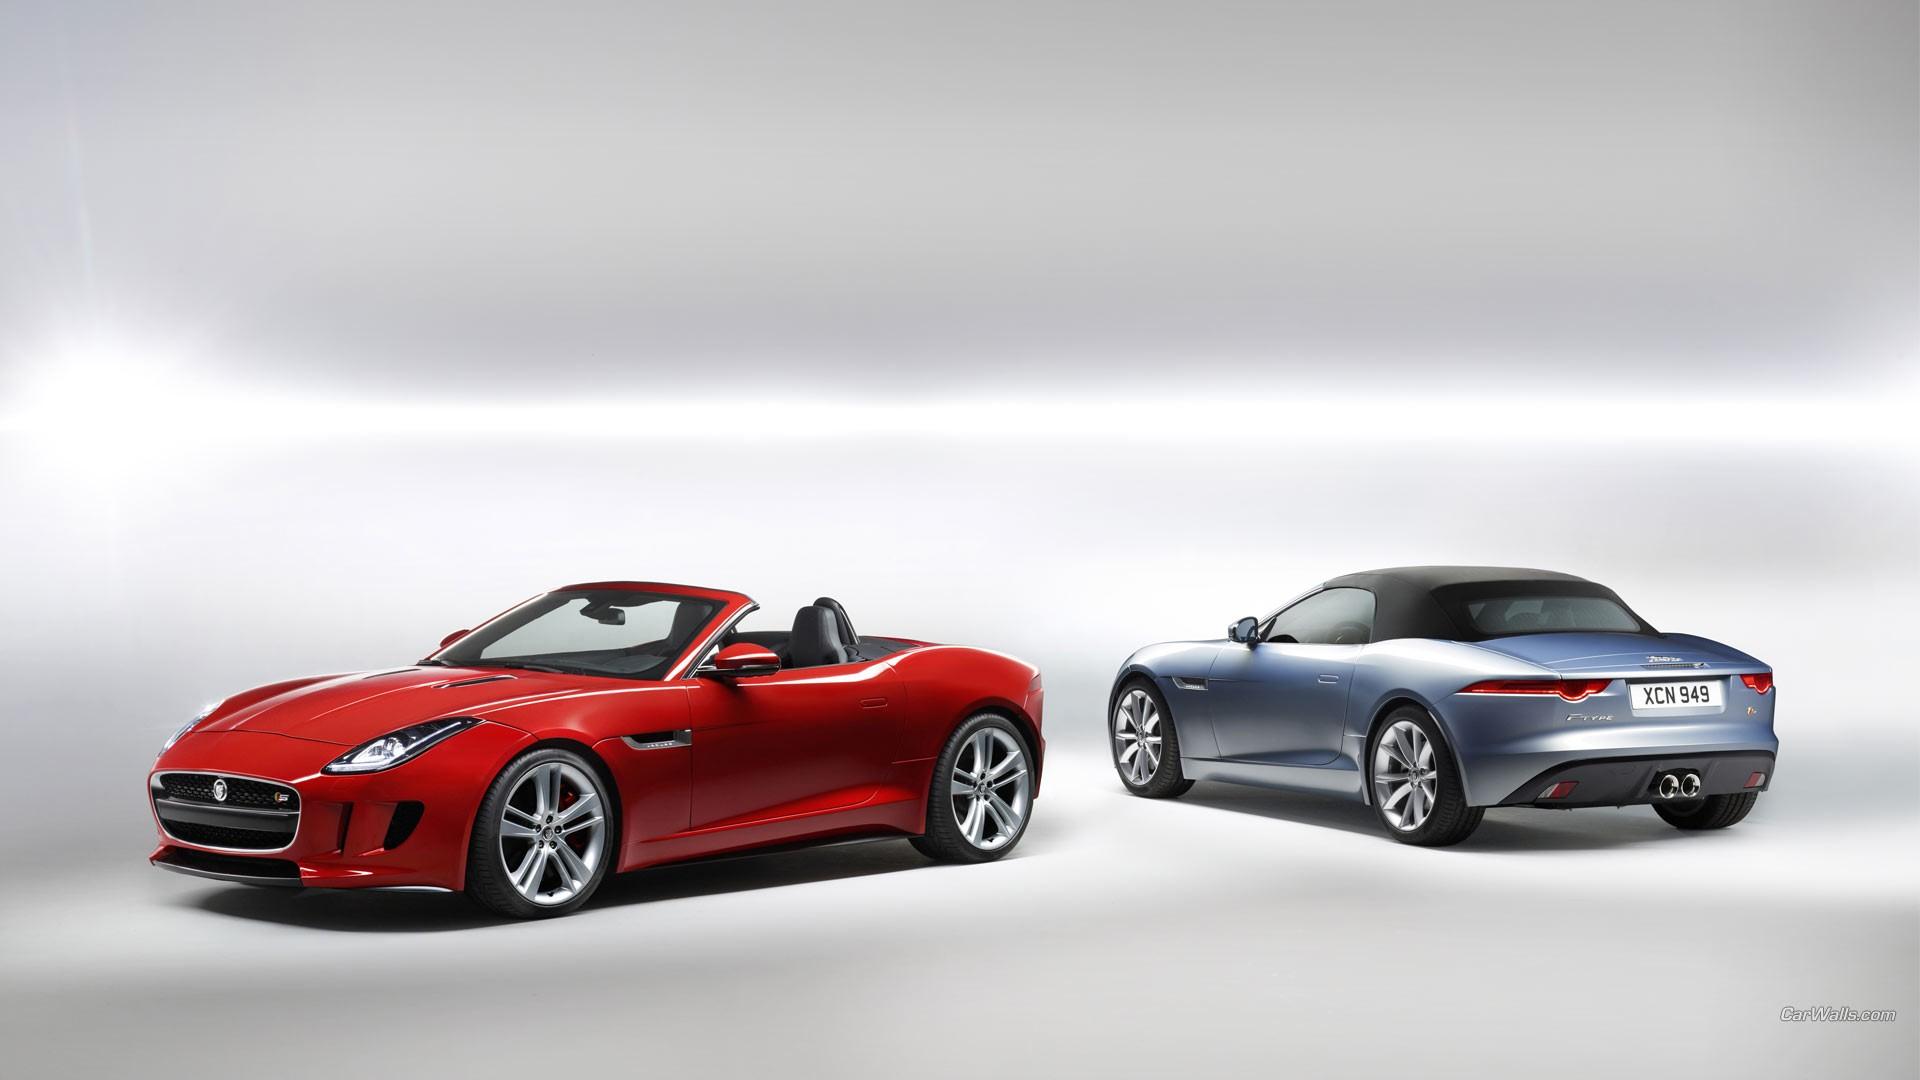 Wallpaper Sports Car Convertible Performance Car Jaguar